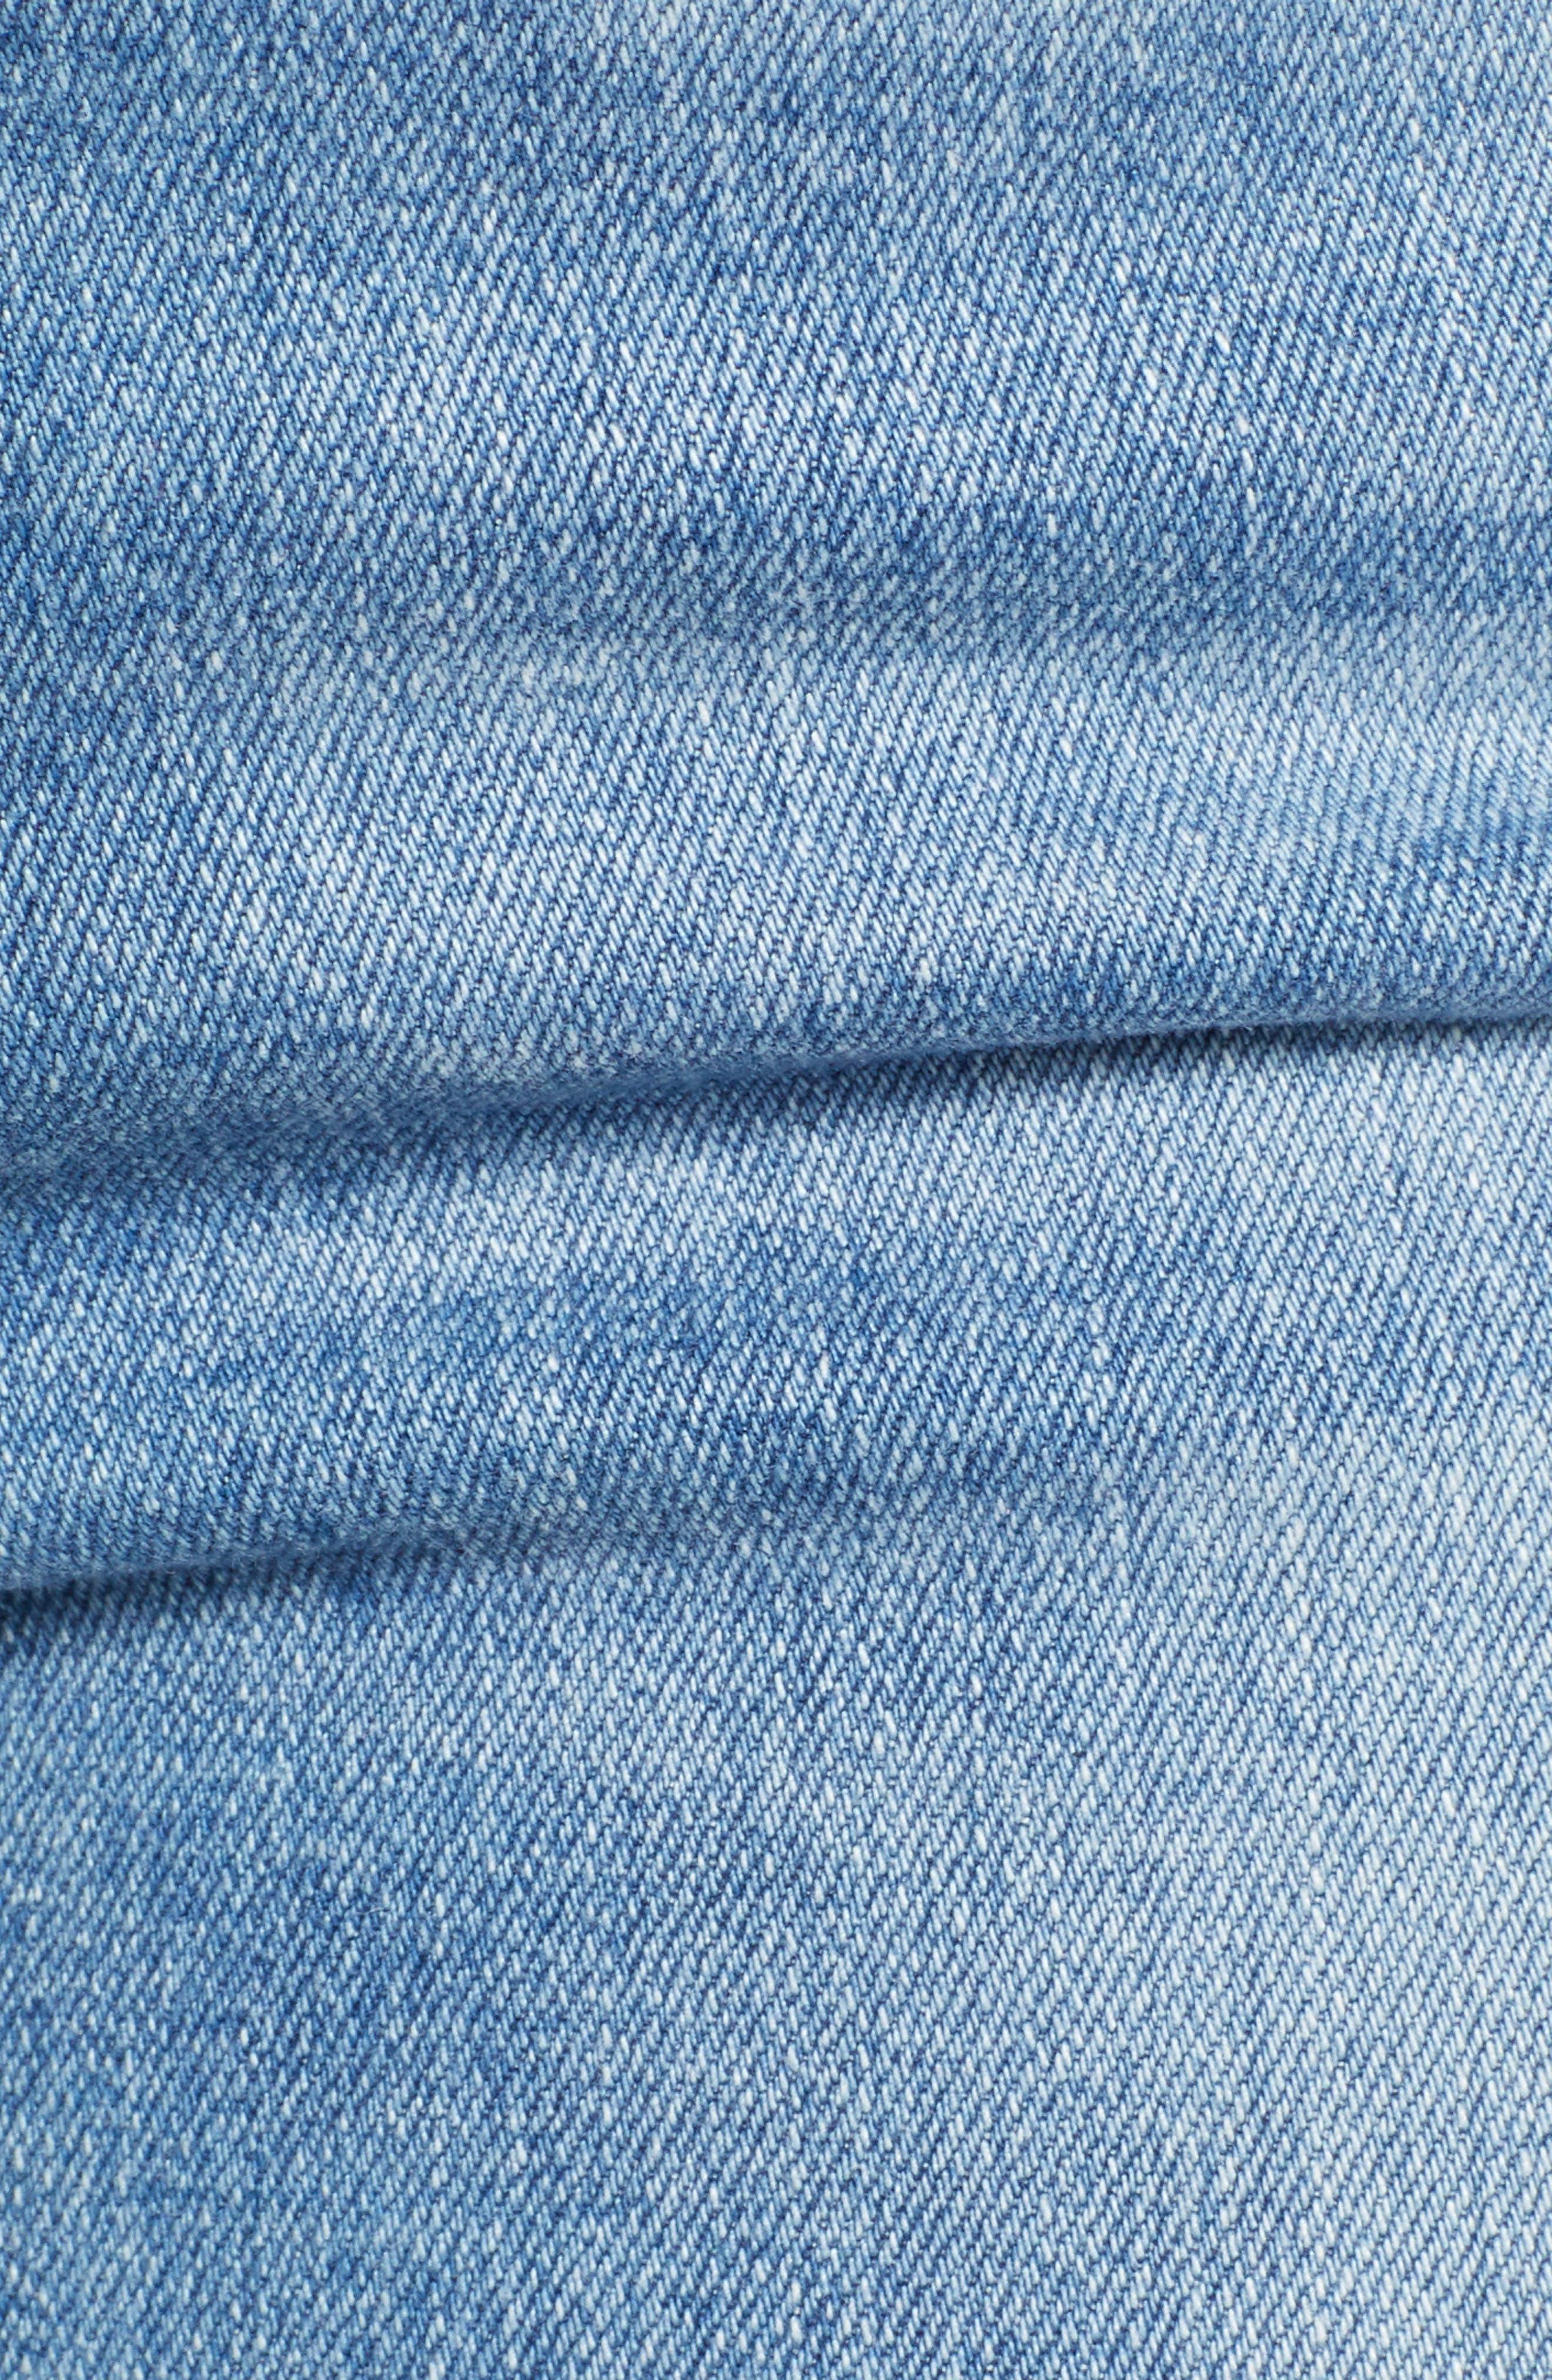 Prima Crop Skinny Jeans,                             Alternate thumbnail 6, color,                             SINGULARITY